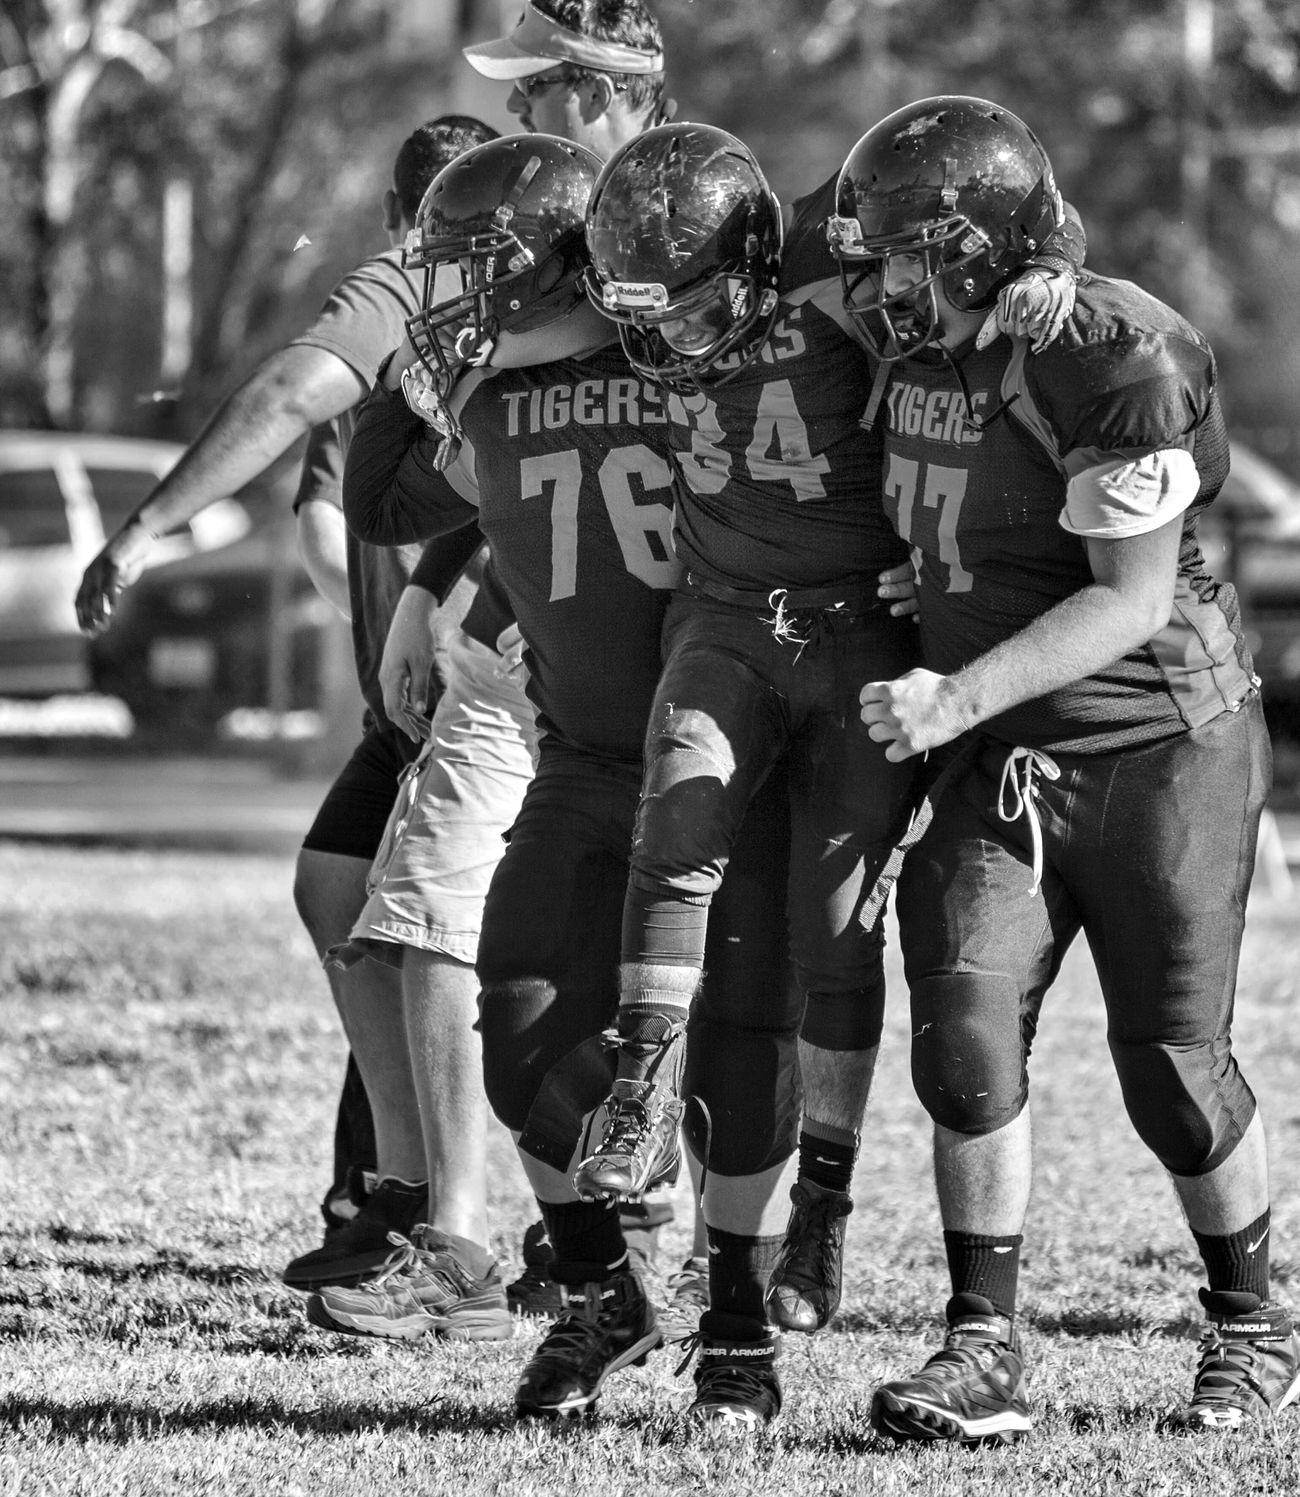 Black & White Football Highschool Los Angeles, California canon 5D